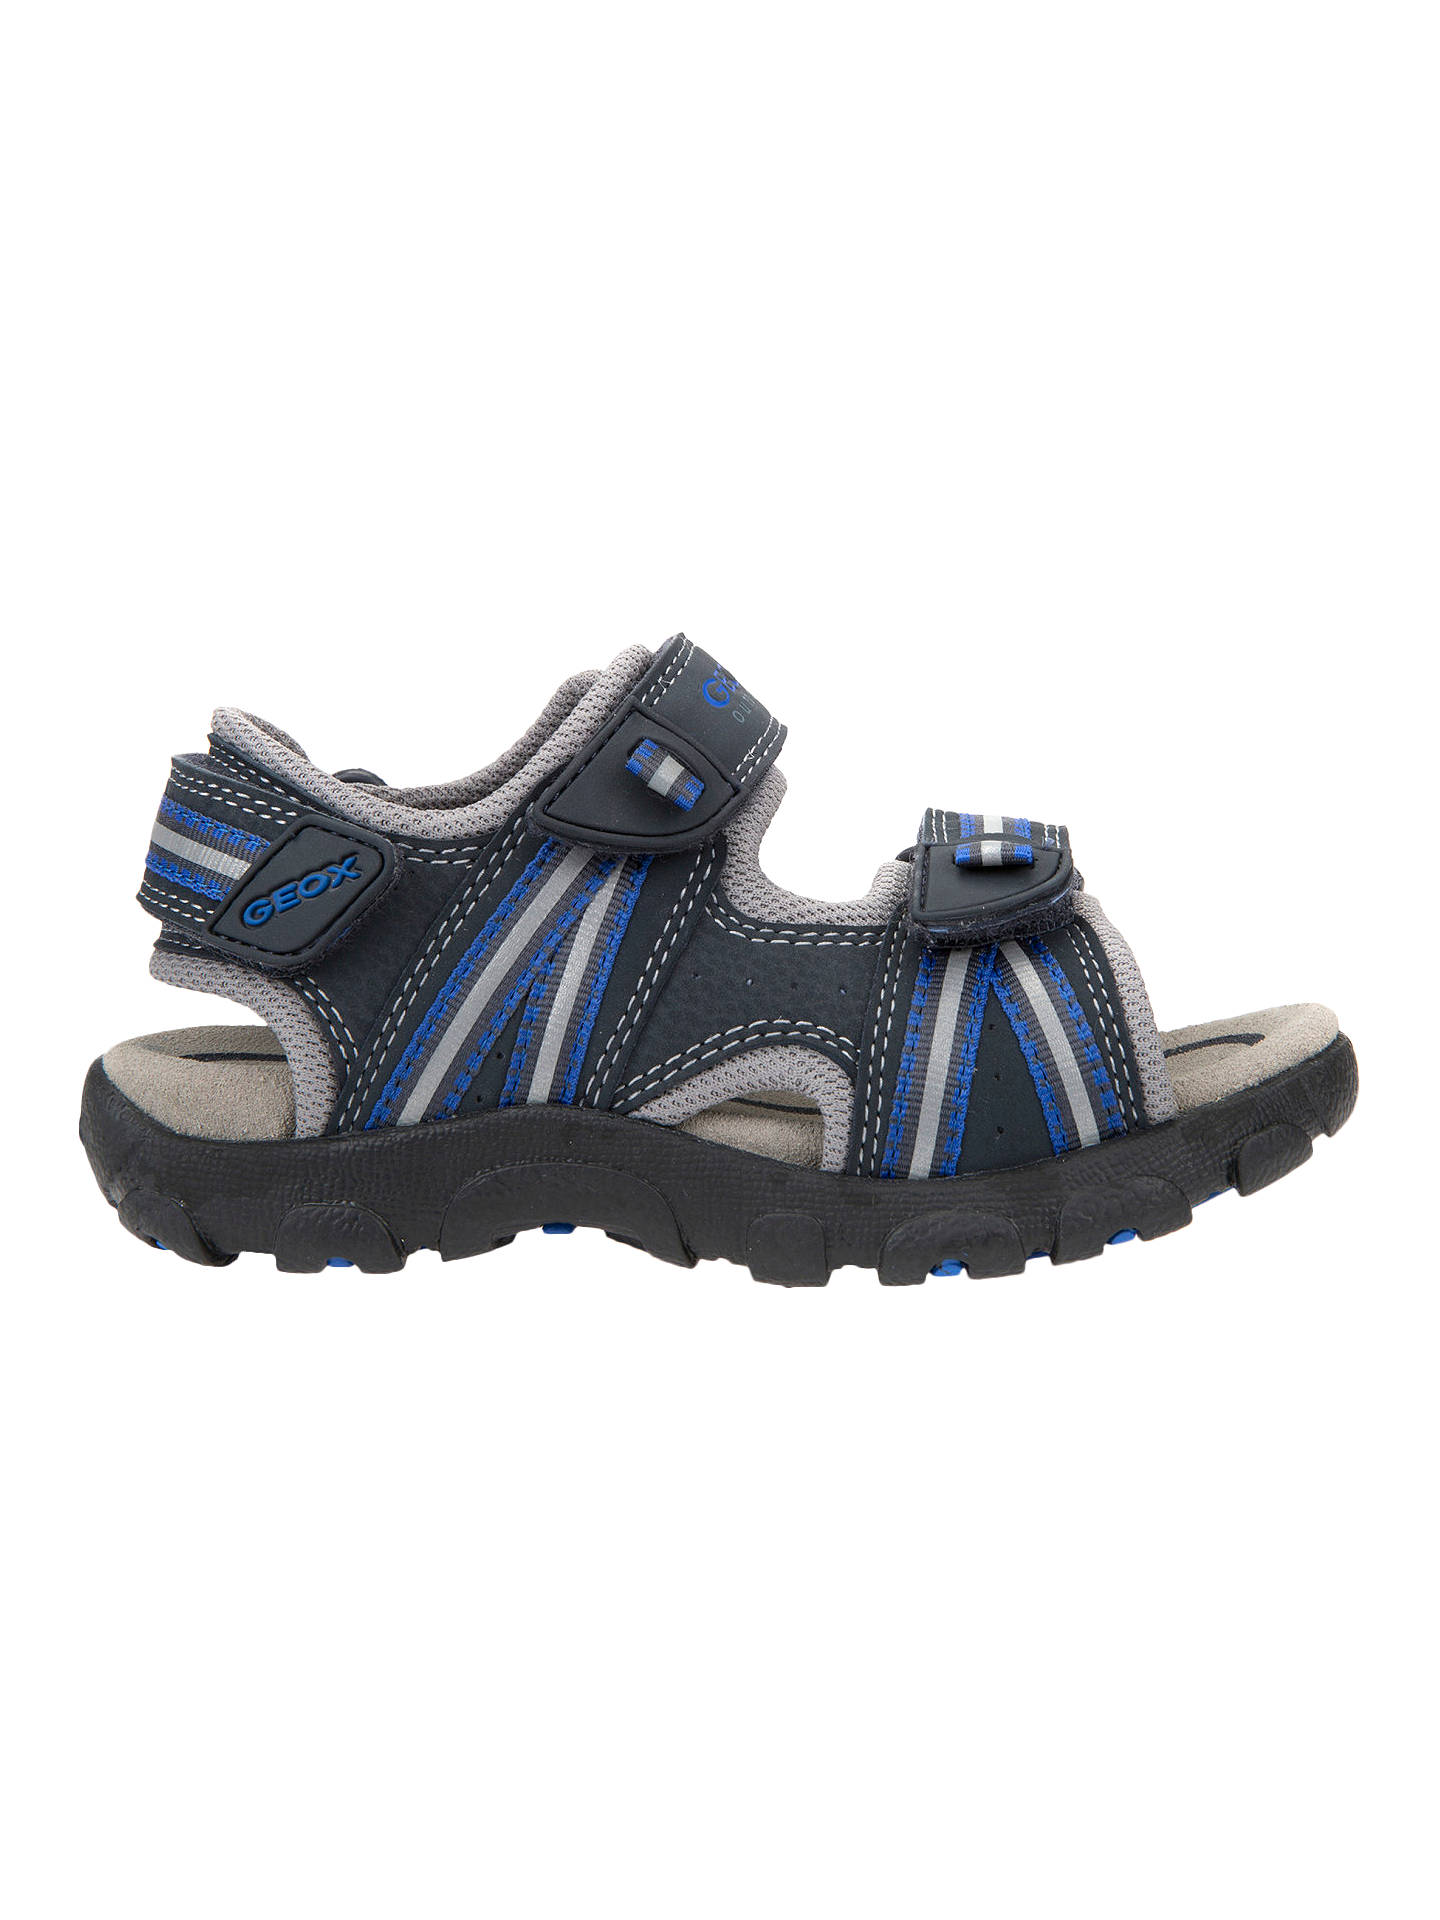 98c5d5b3027 Buy Geox Children's Junior Strada Sandals, Navy, 26 Online at johnlewis. ...